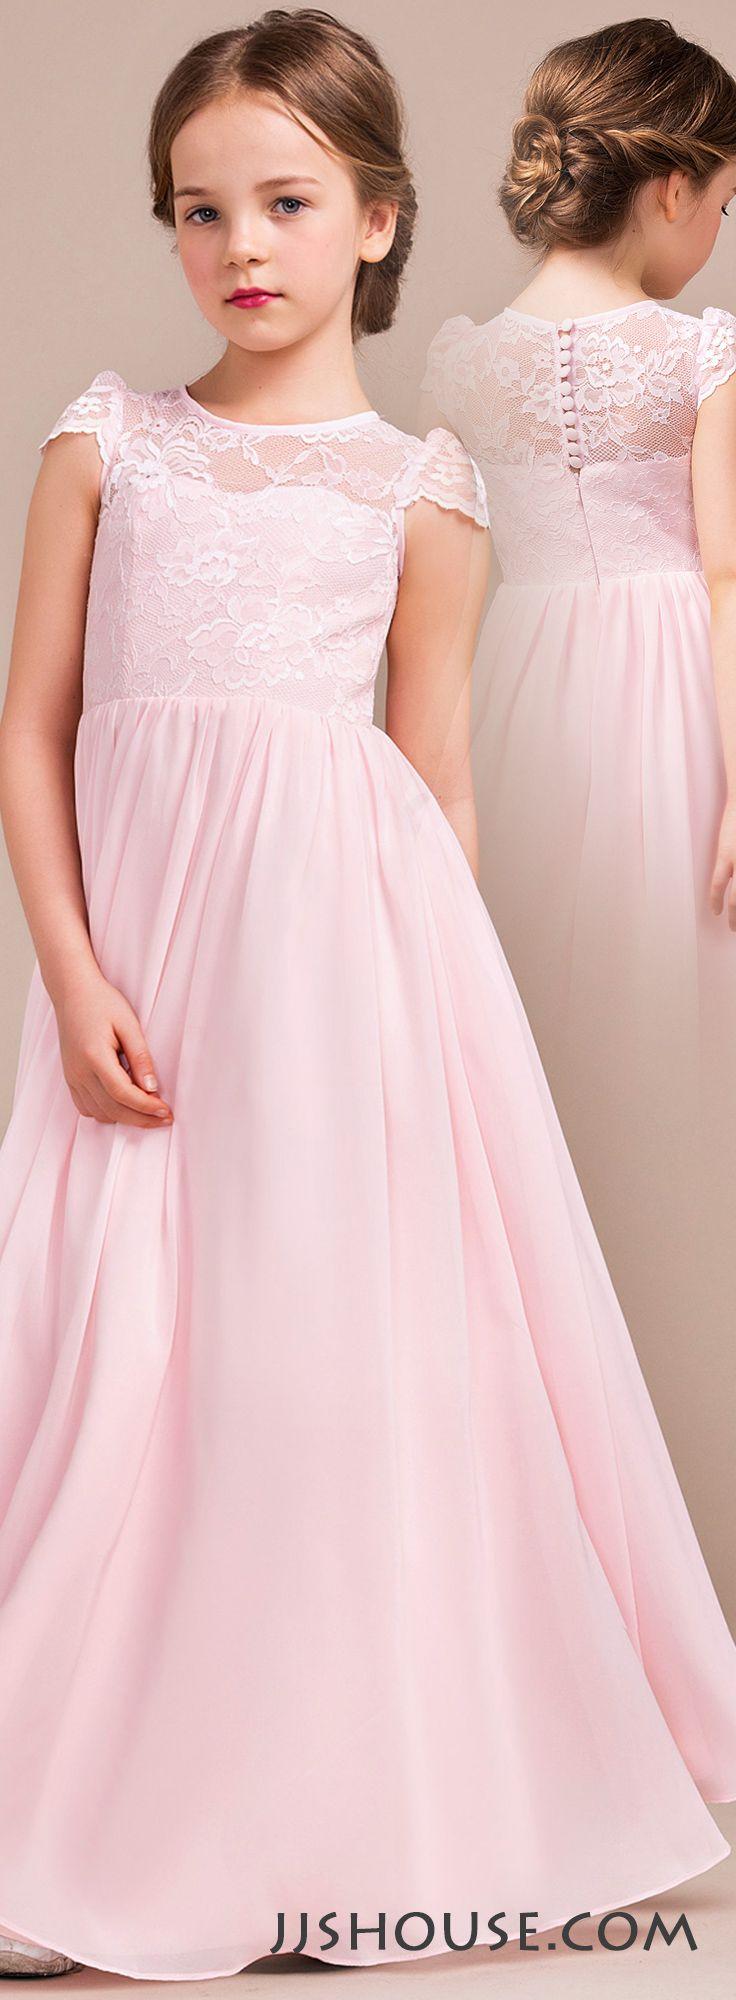 Sweet junior bridesmaid dress. #jjshouse